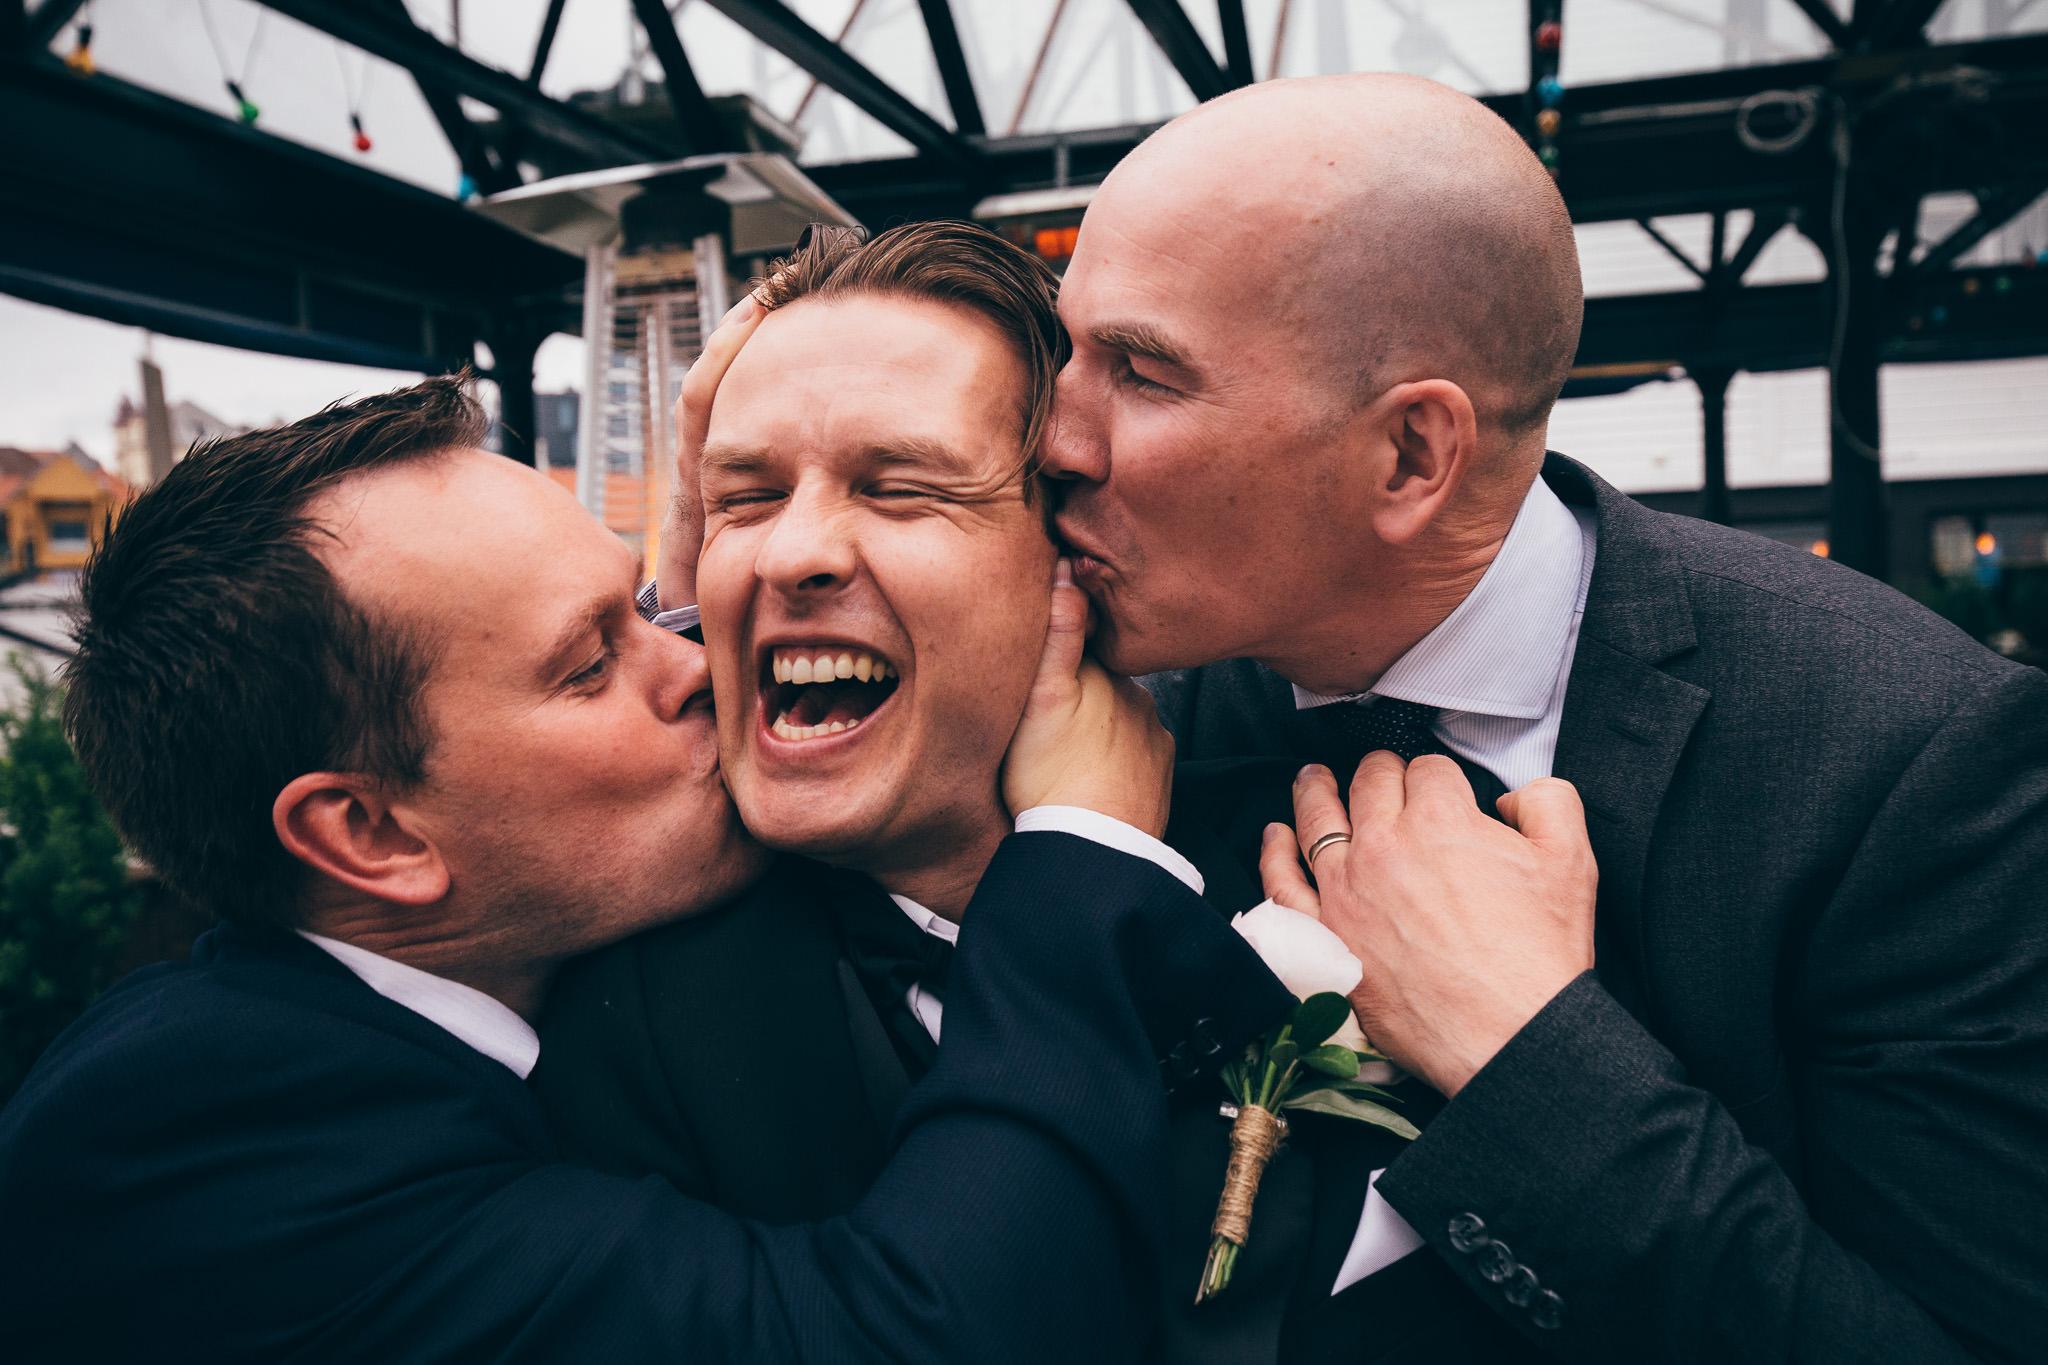 Wedding+Photographer+Norway+Bryllupsfotograf+Casey+Arneson+MK-191.jpg